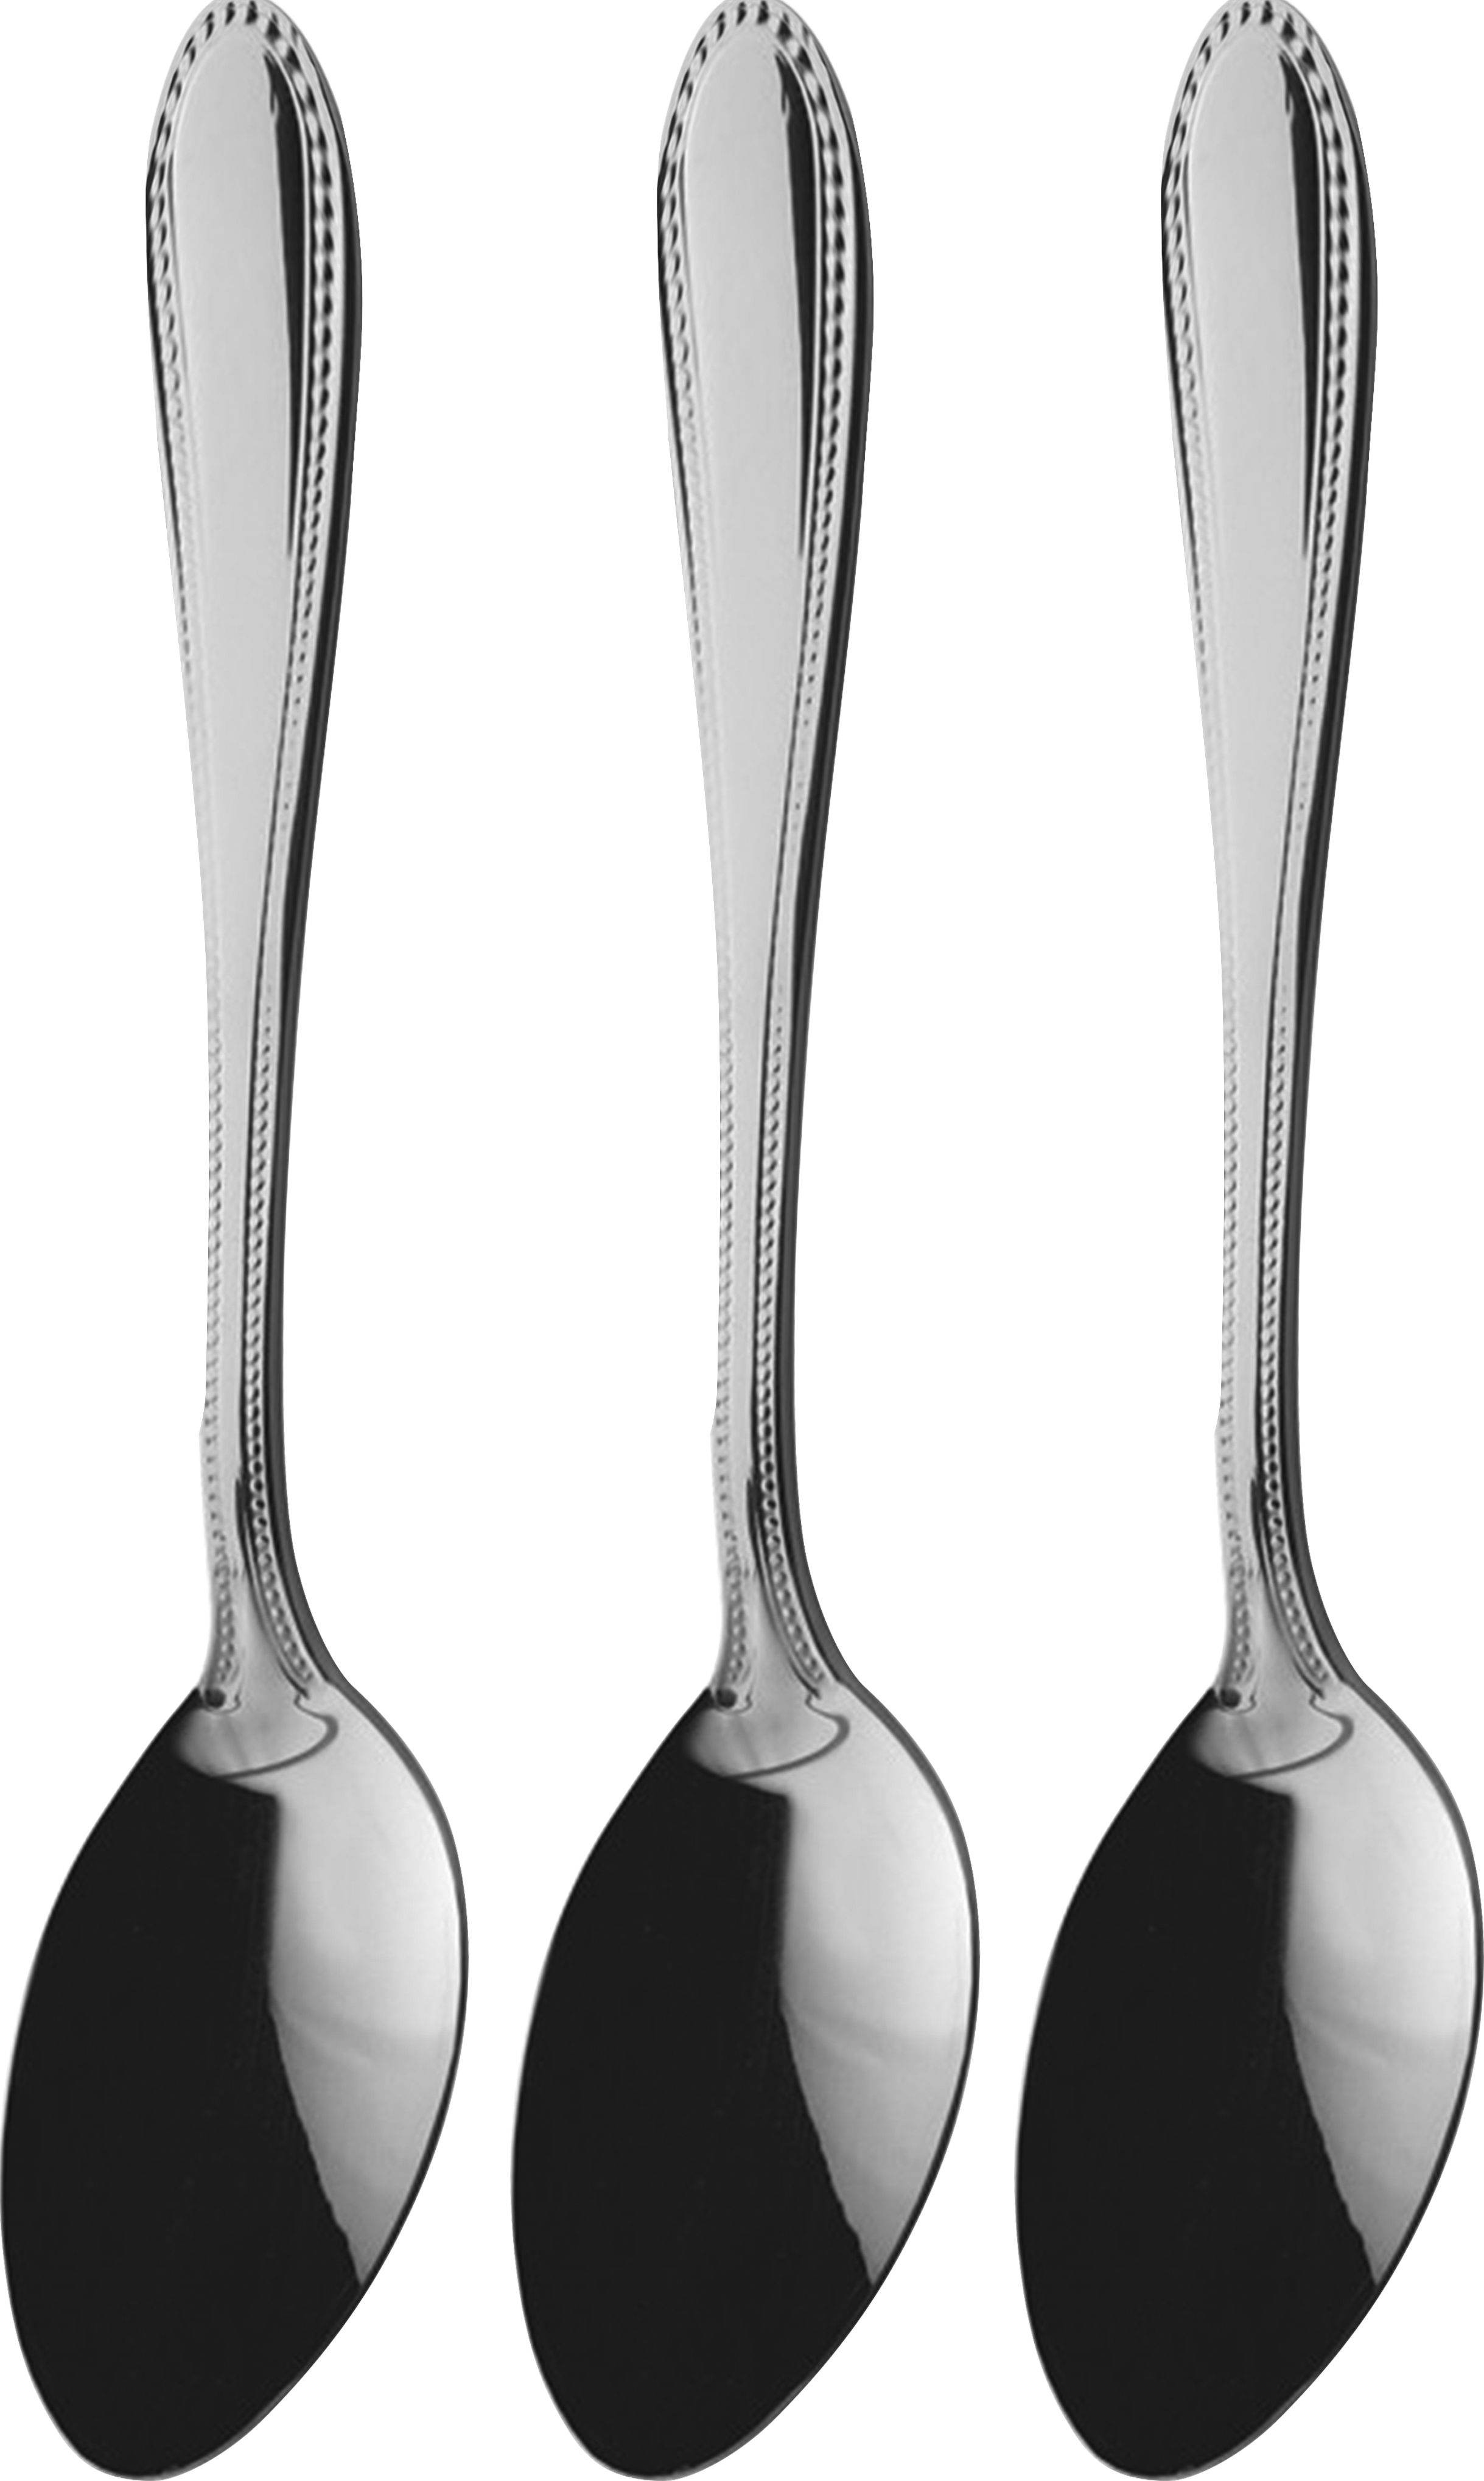 Набор чайных ложек Atmosphere Facile, 3 предмета набор чайных ложек dalper президент 3 предмета